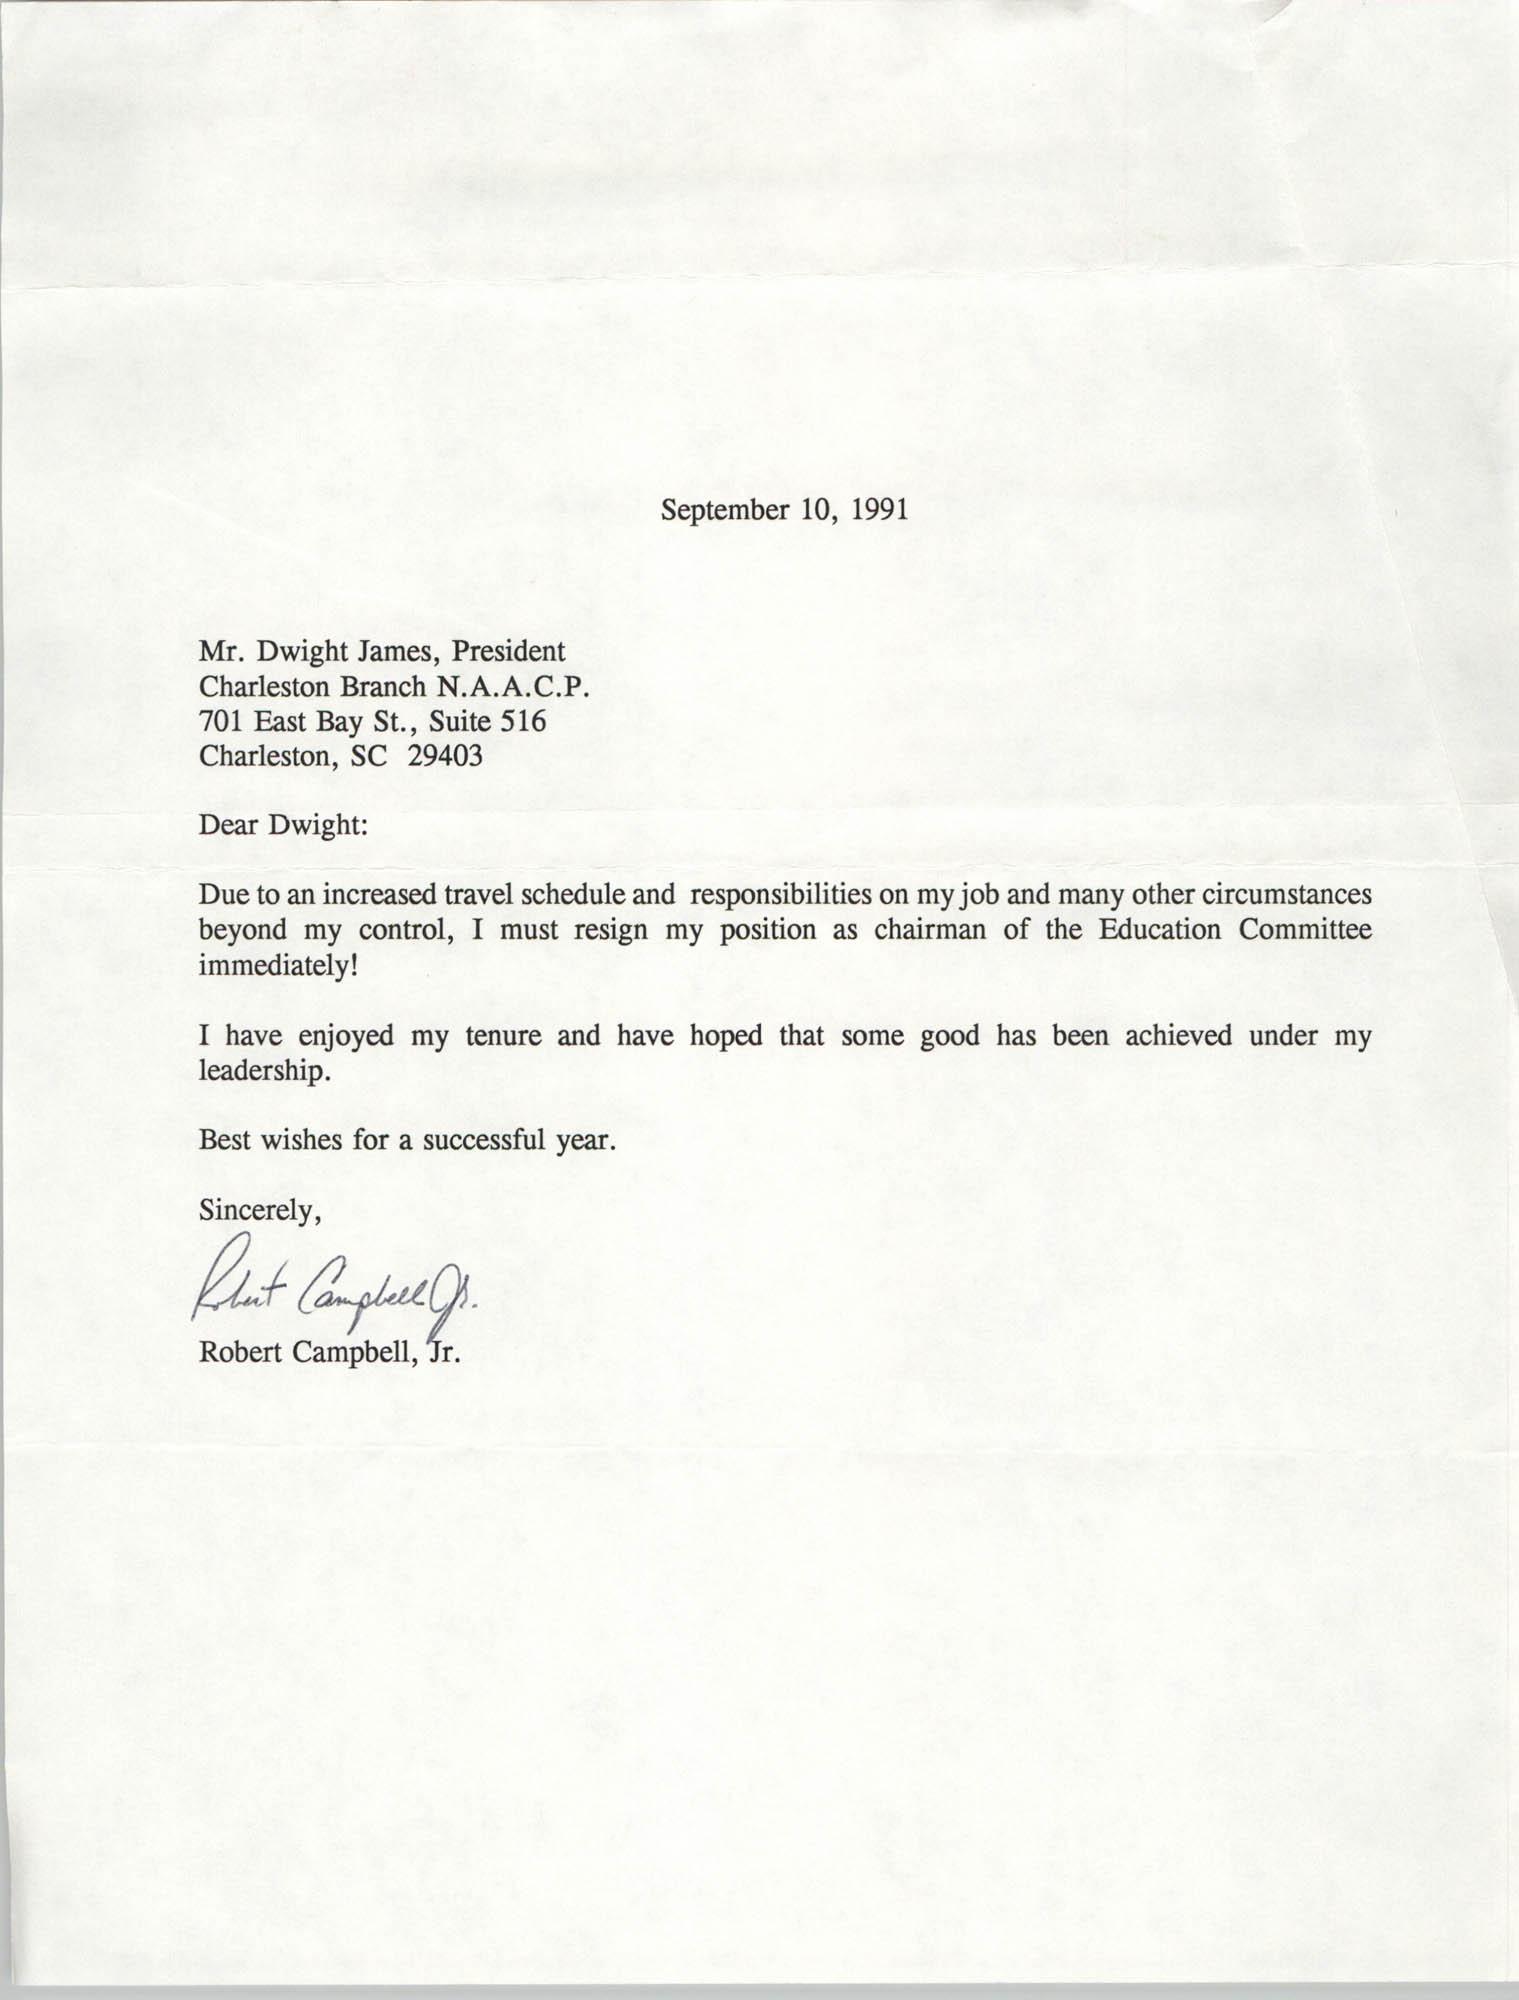 Letter from Robert Campbell, Jr. to Dwight James, September 10, 1991